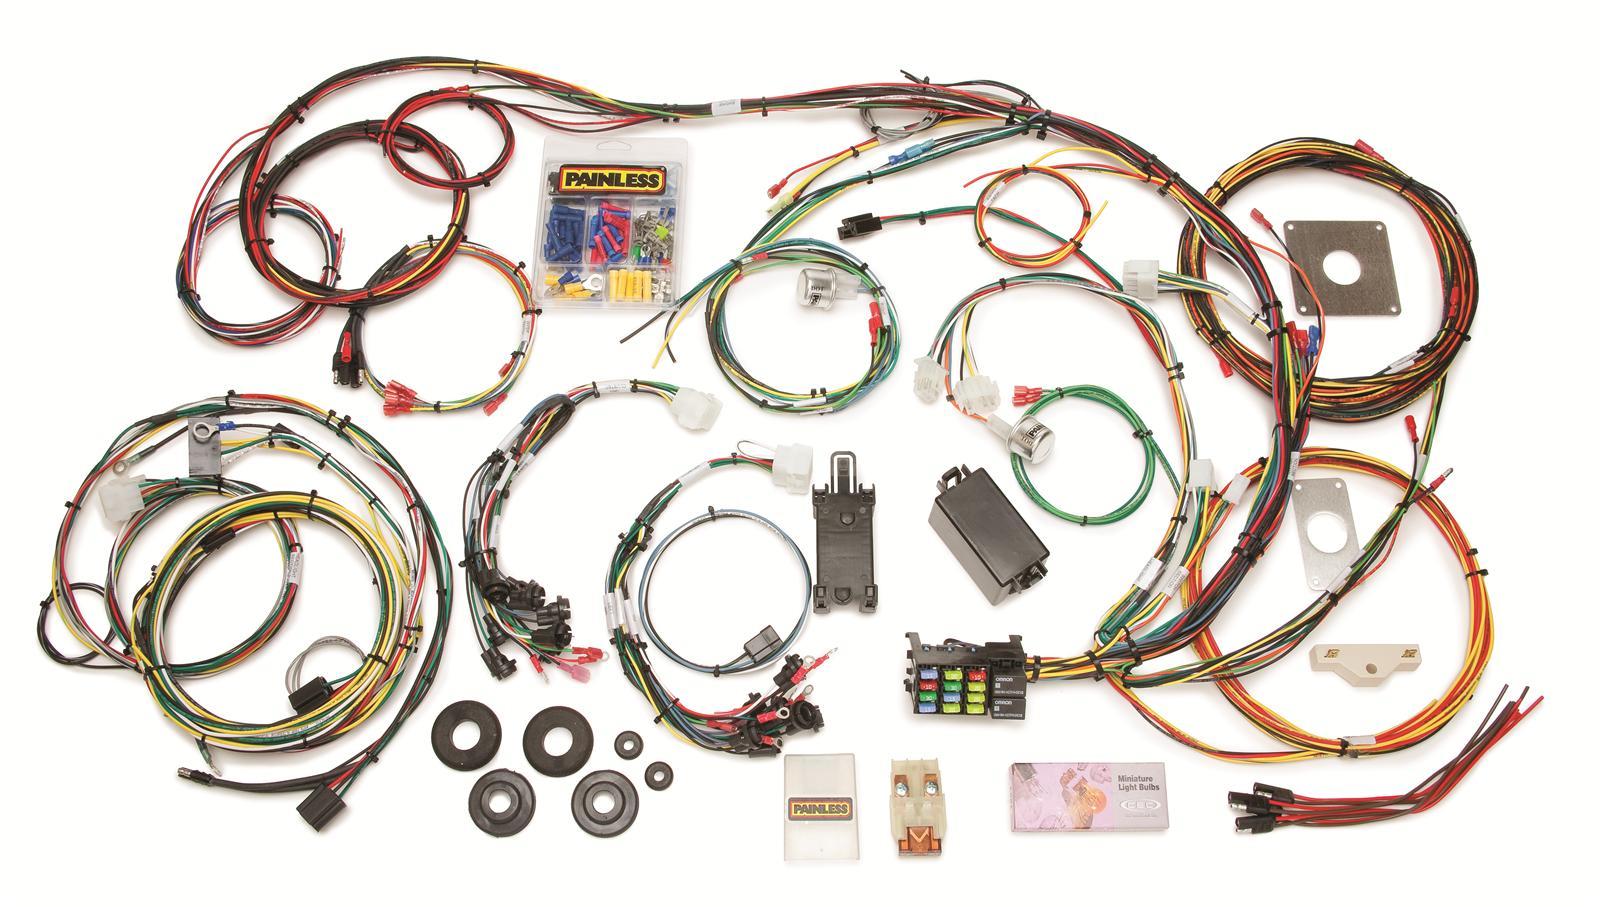 12 circuit painless wiring harness 20103 painless wiring harness toyota fj40 painless wiring 20120 wiring harness 12-circuit dash | ebay